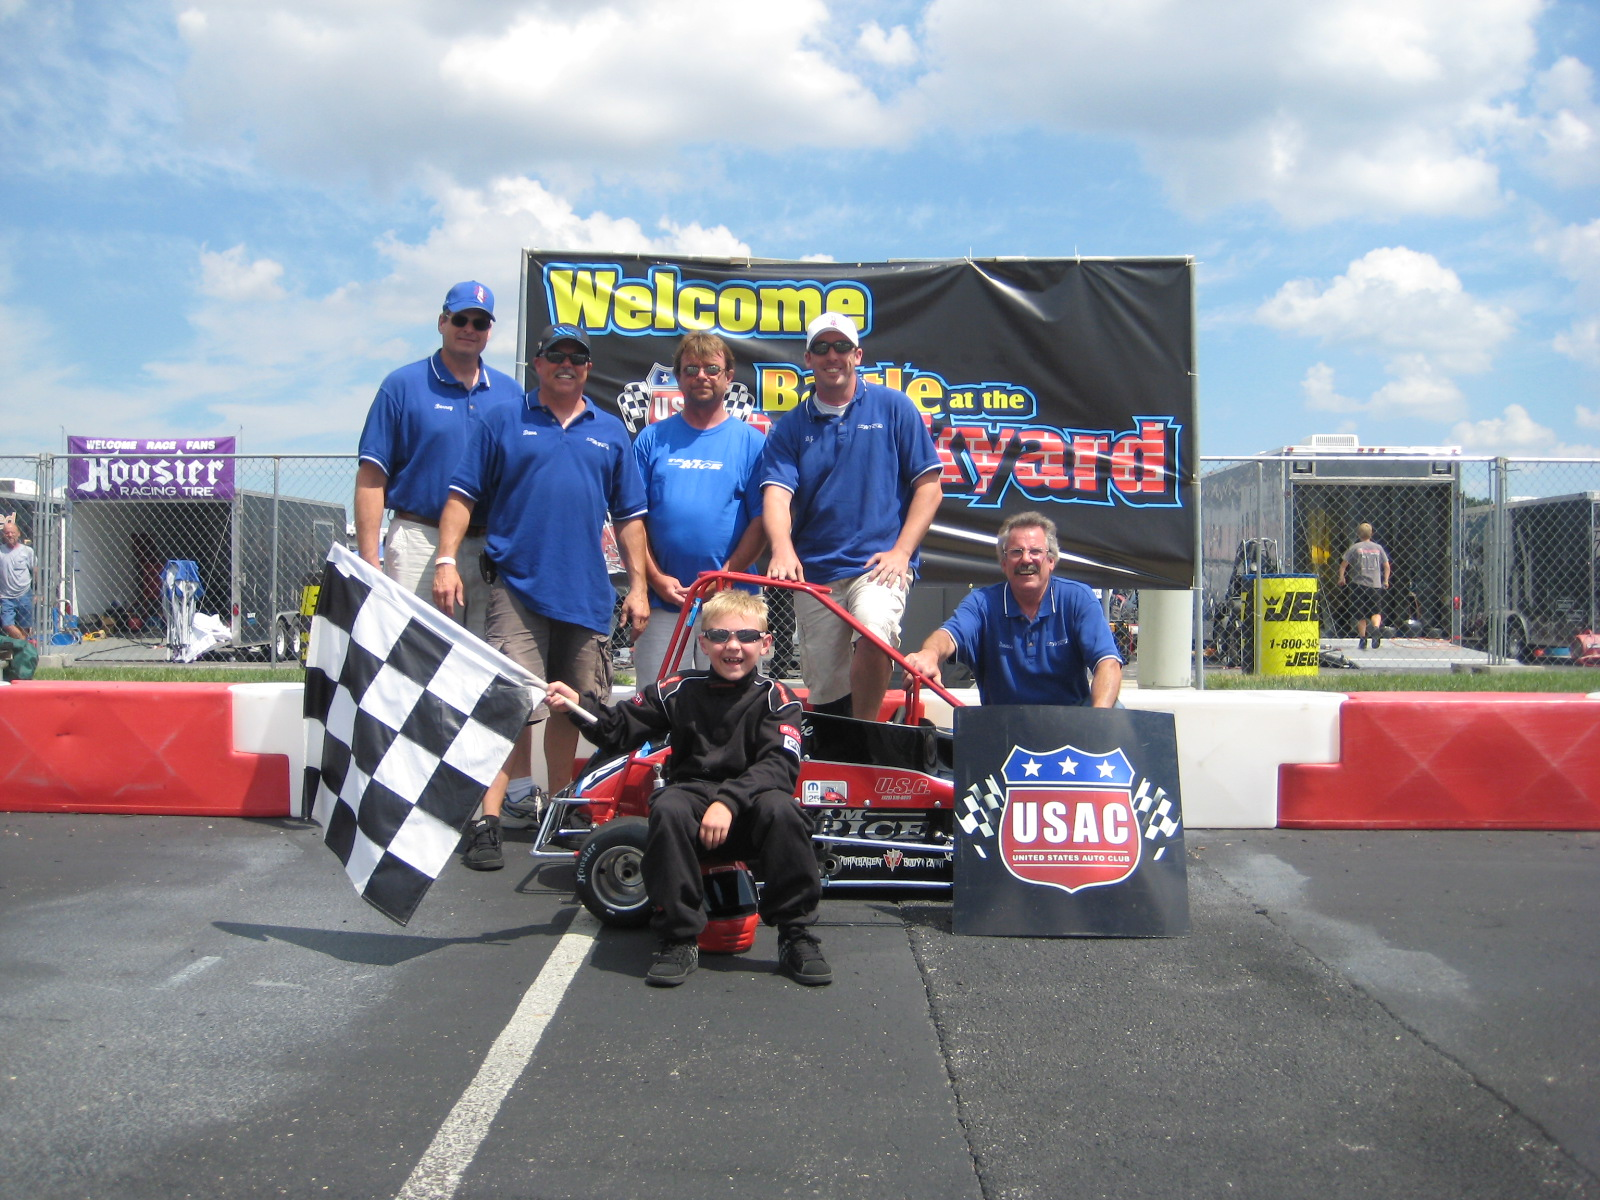 Asphalt midget race car, high heals teen pics